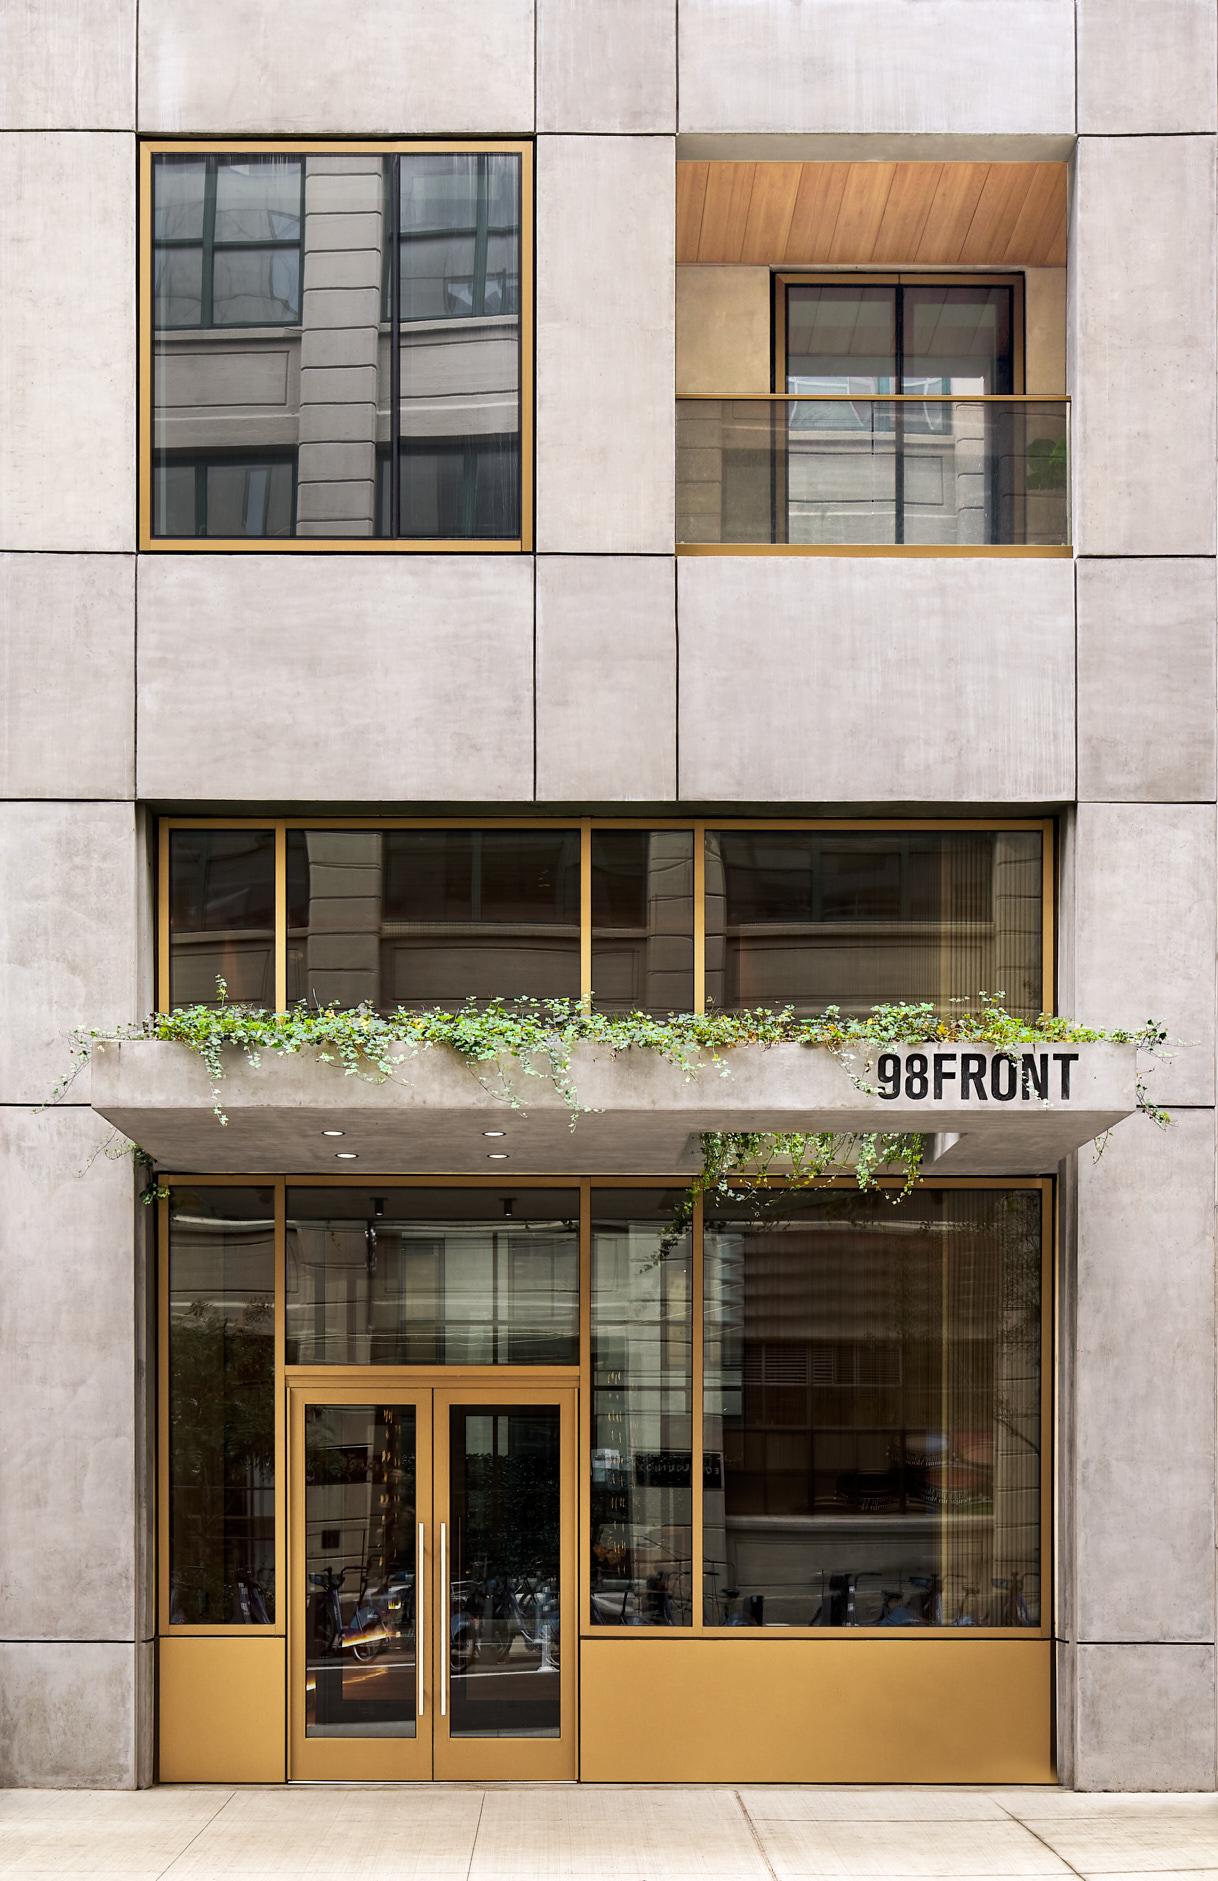 2_AThompson_98-Front